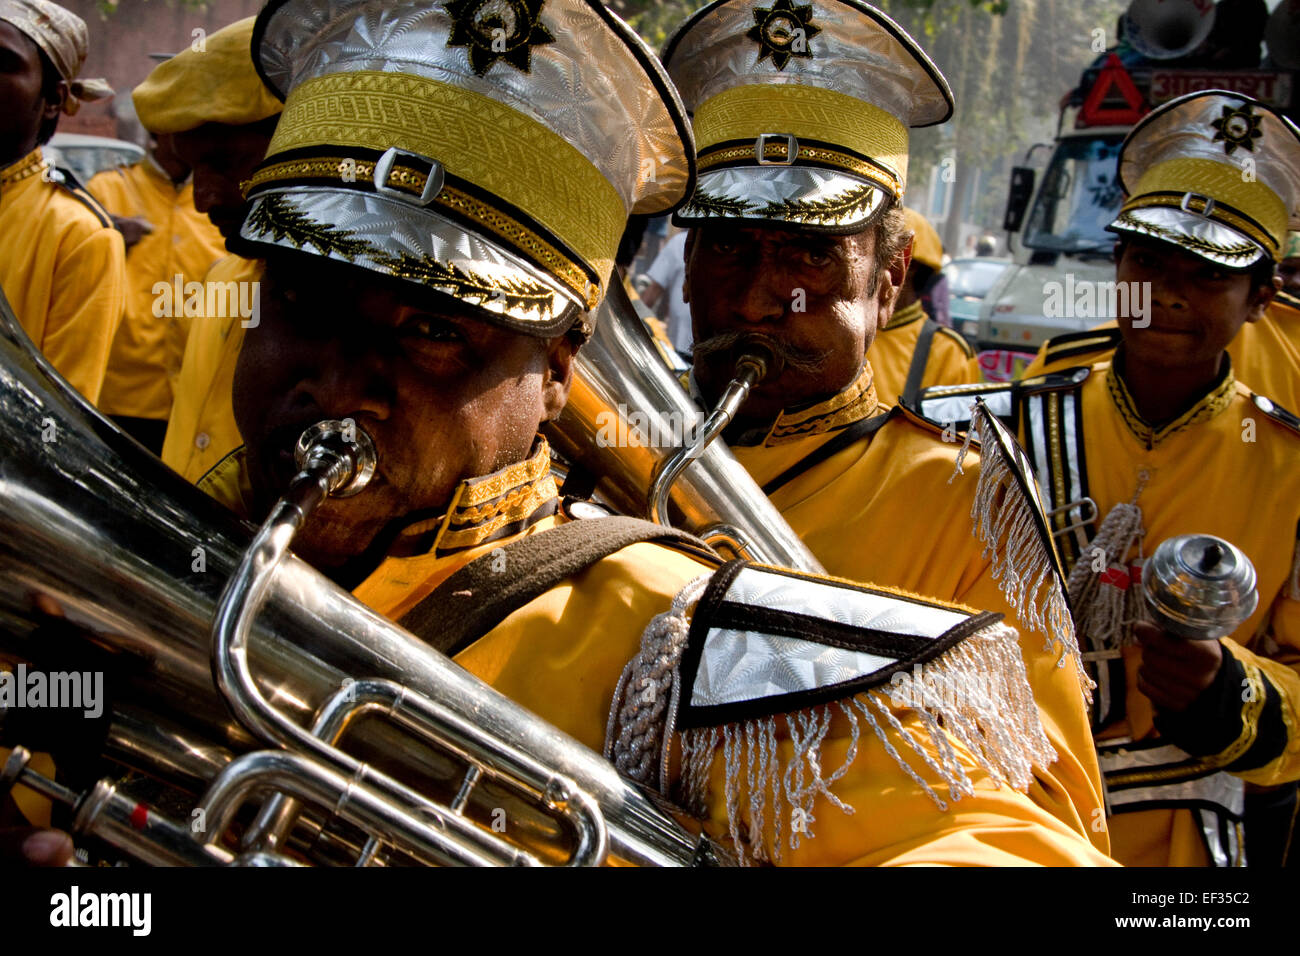 New Delhi, India - November 19, 2011: Sikh people